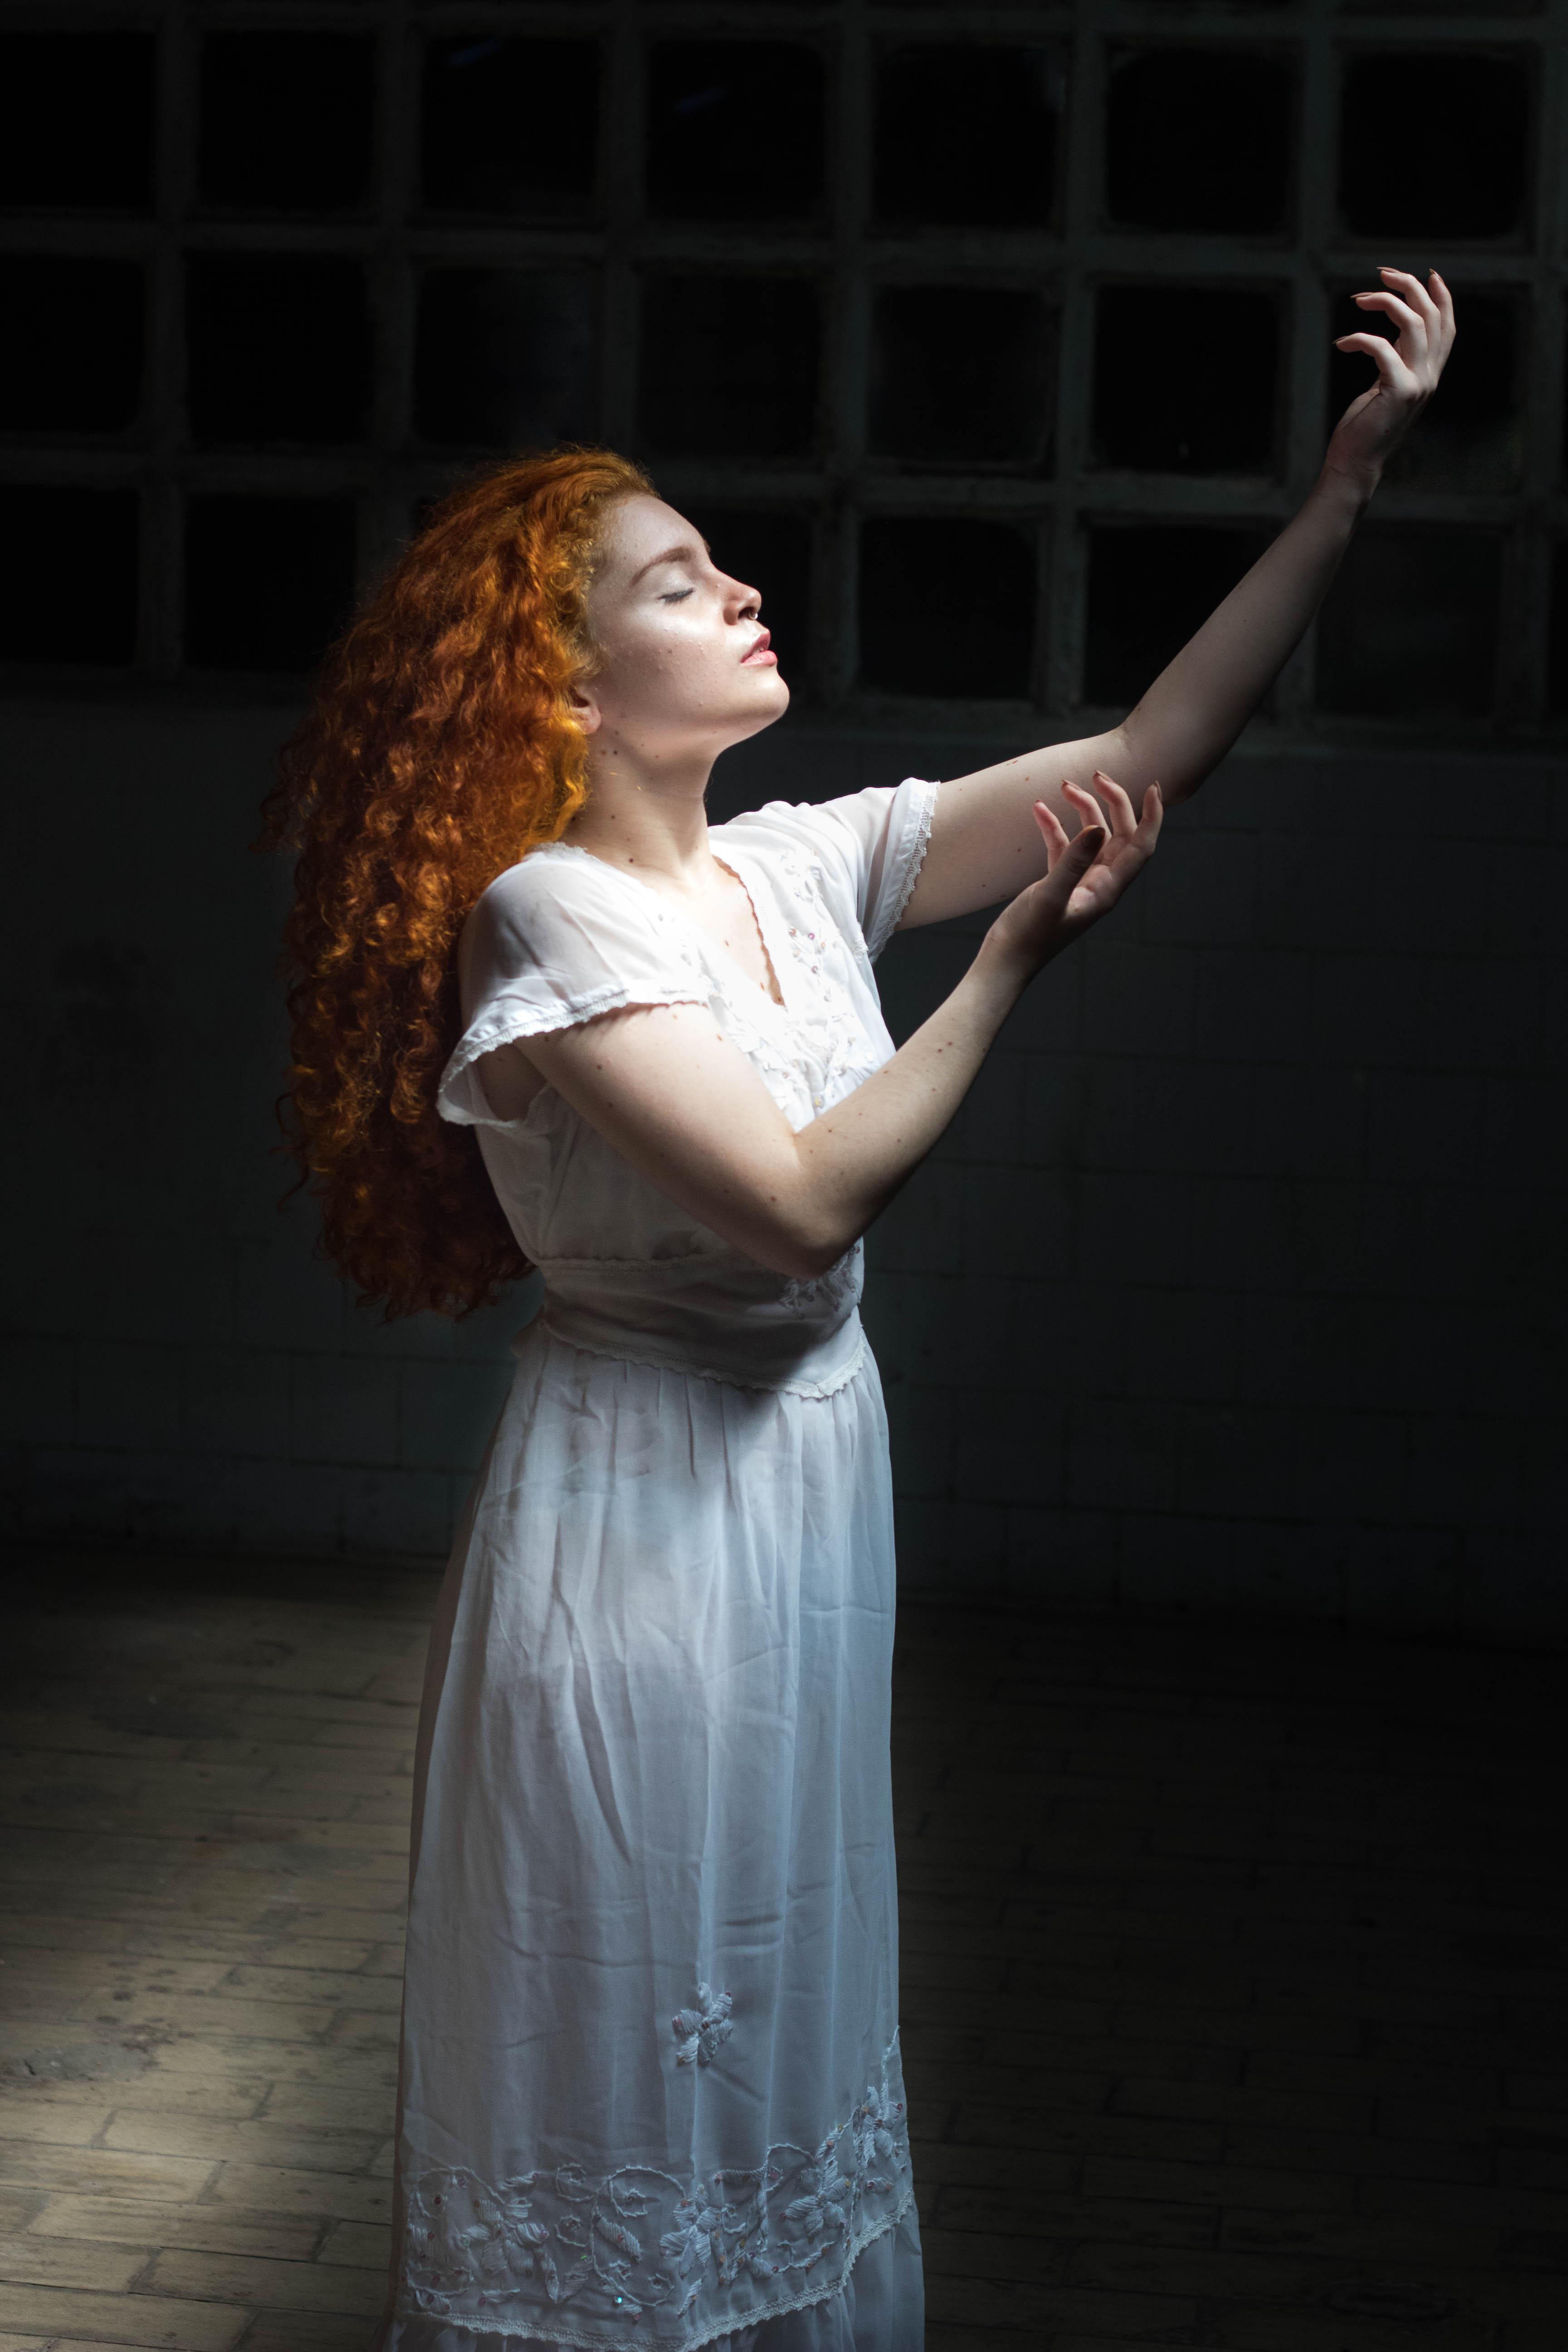 Woman Wearing White Dress Raising Her Hands